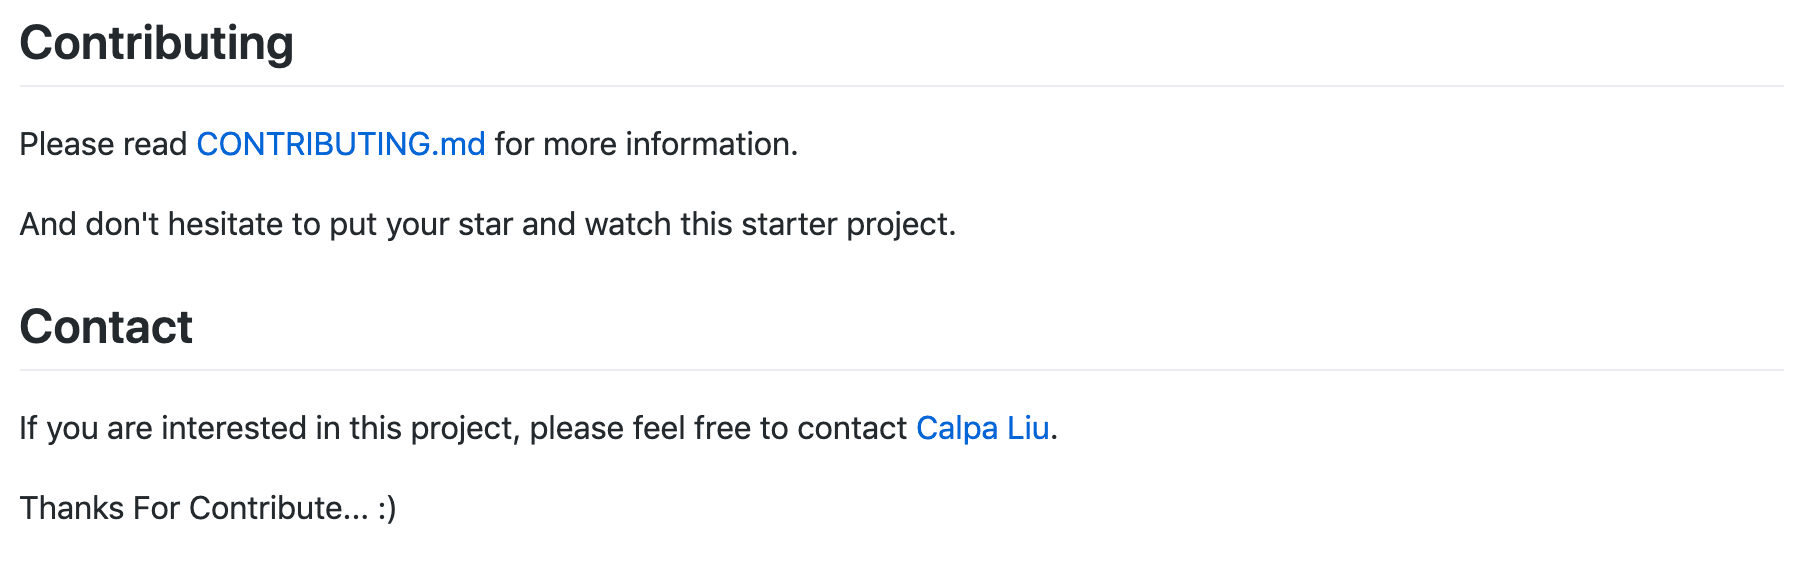 Calpa Blog Contributing